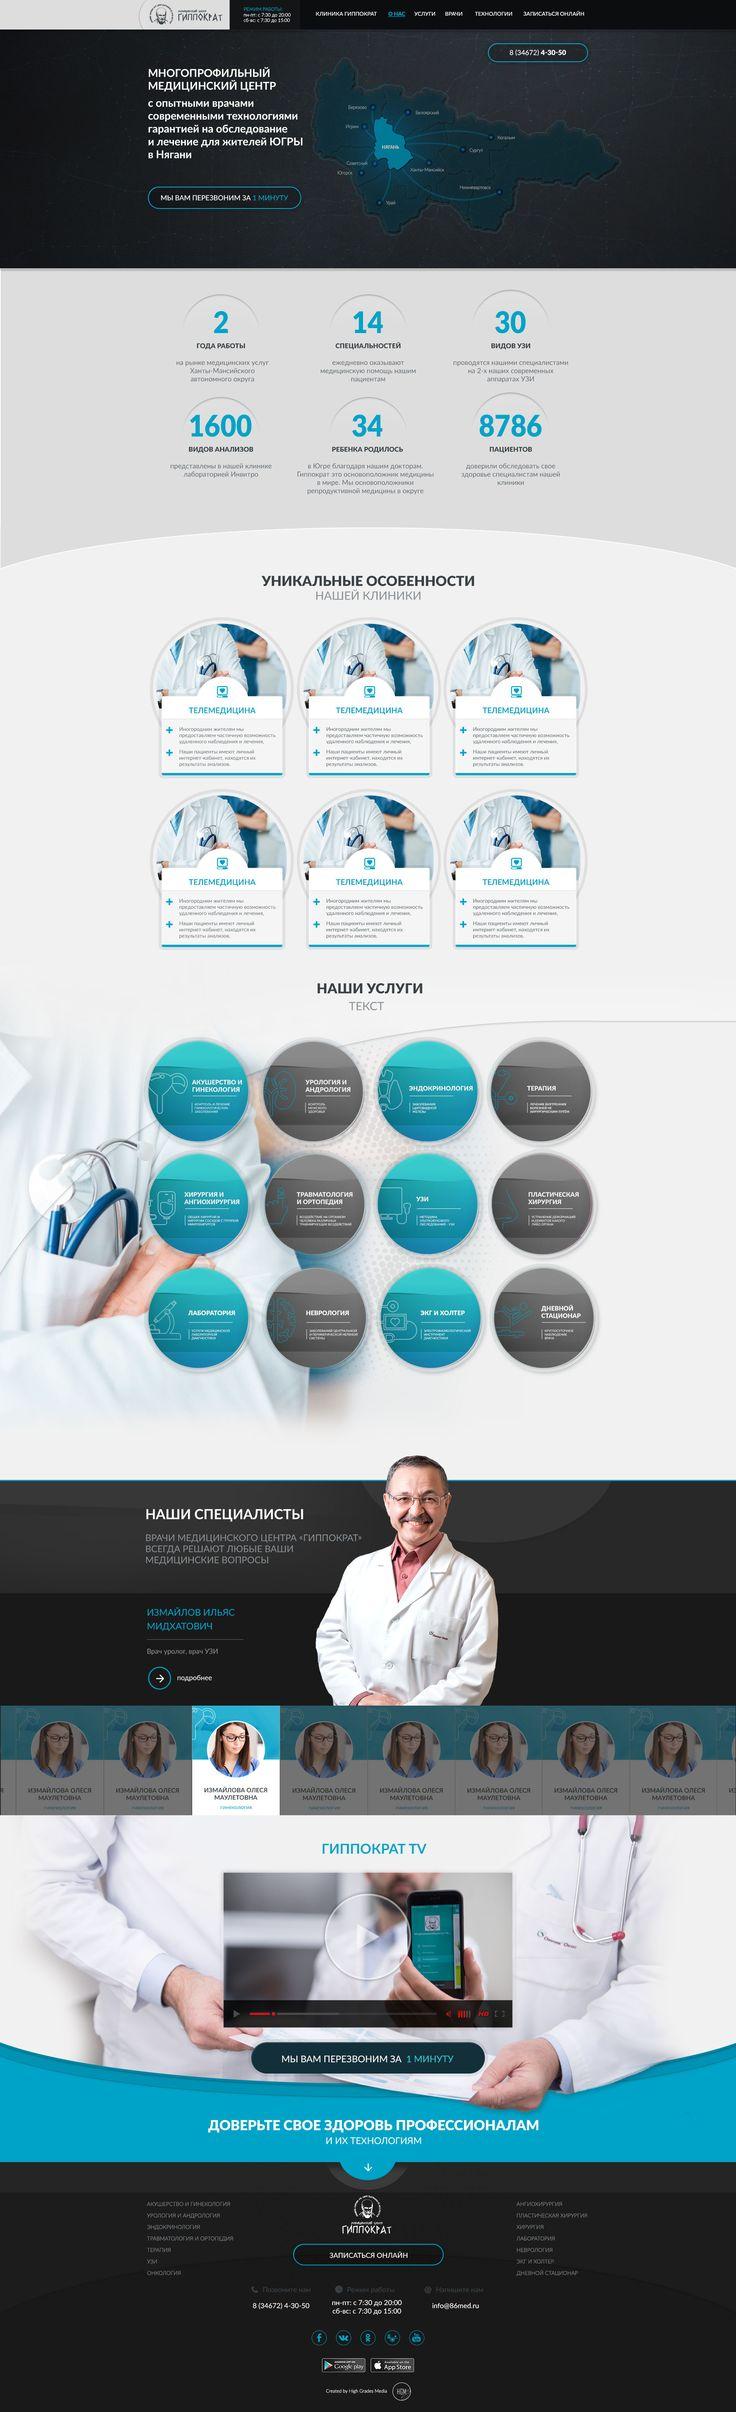 GIPPOCRATES medical centre  #landing, #page, #design, #web, #UI/UX,  #HTML5, #photoshop, #website, #medical,  #clinic